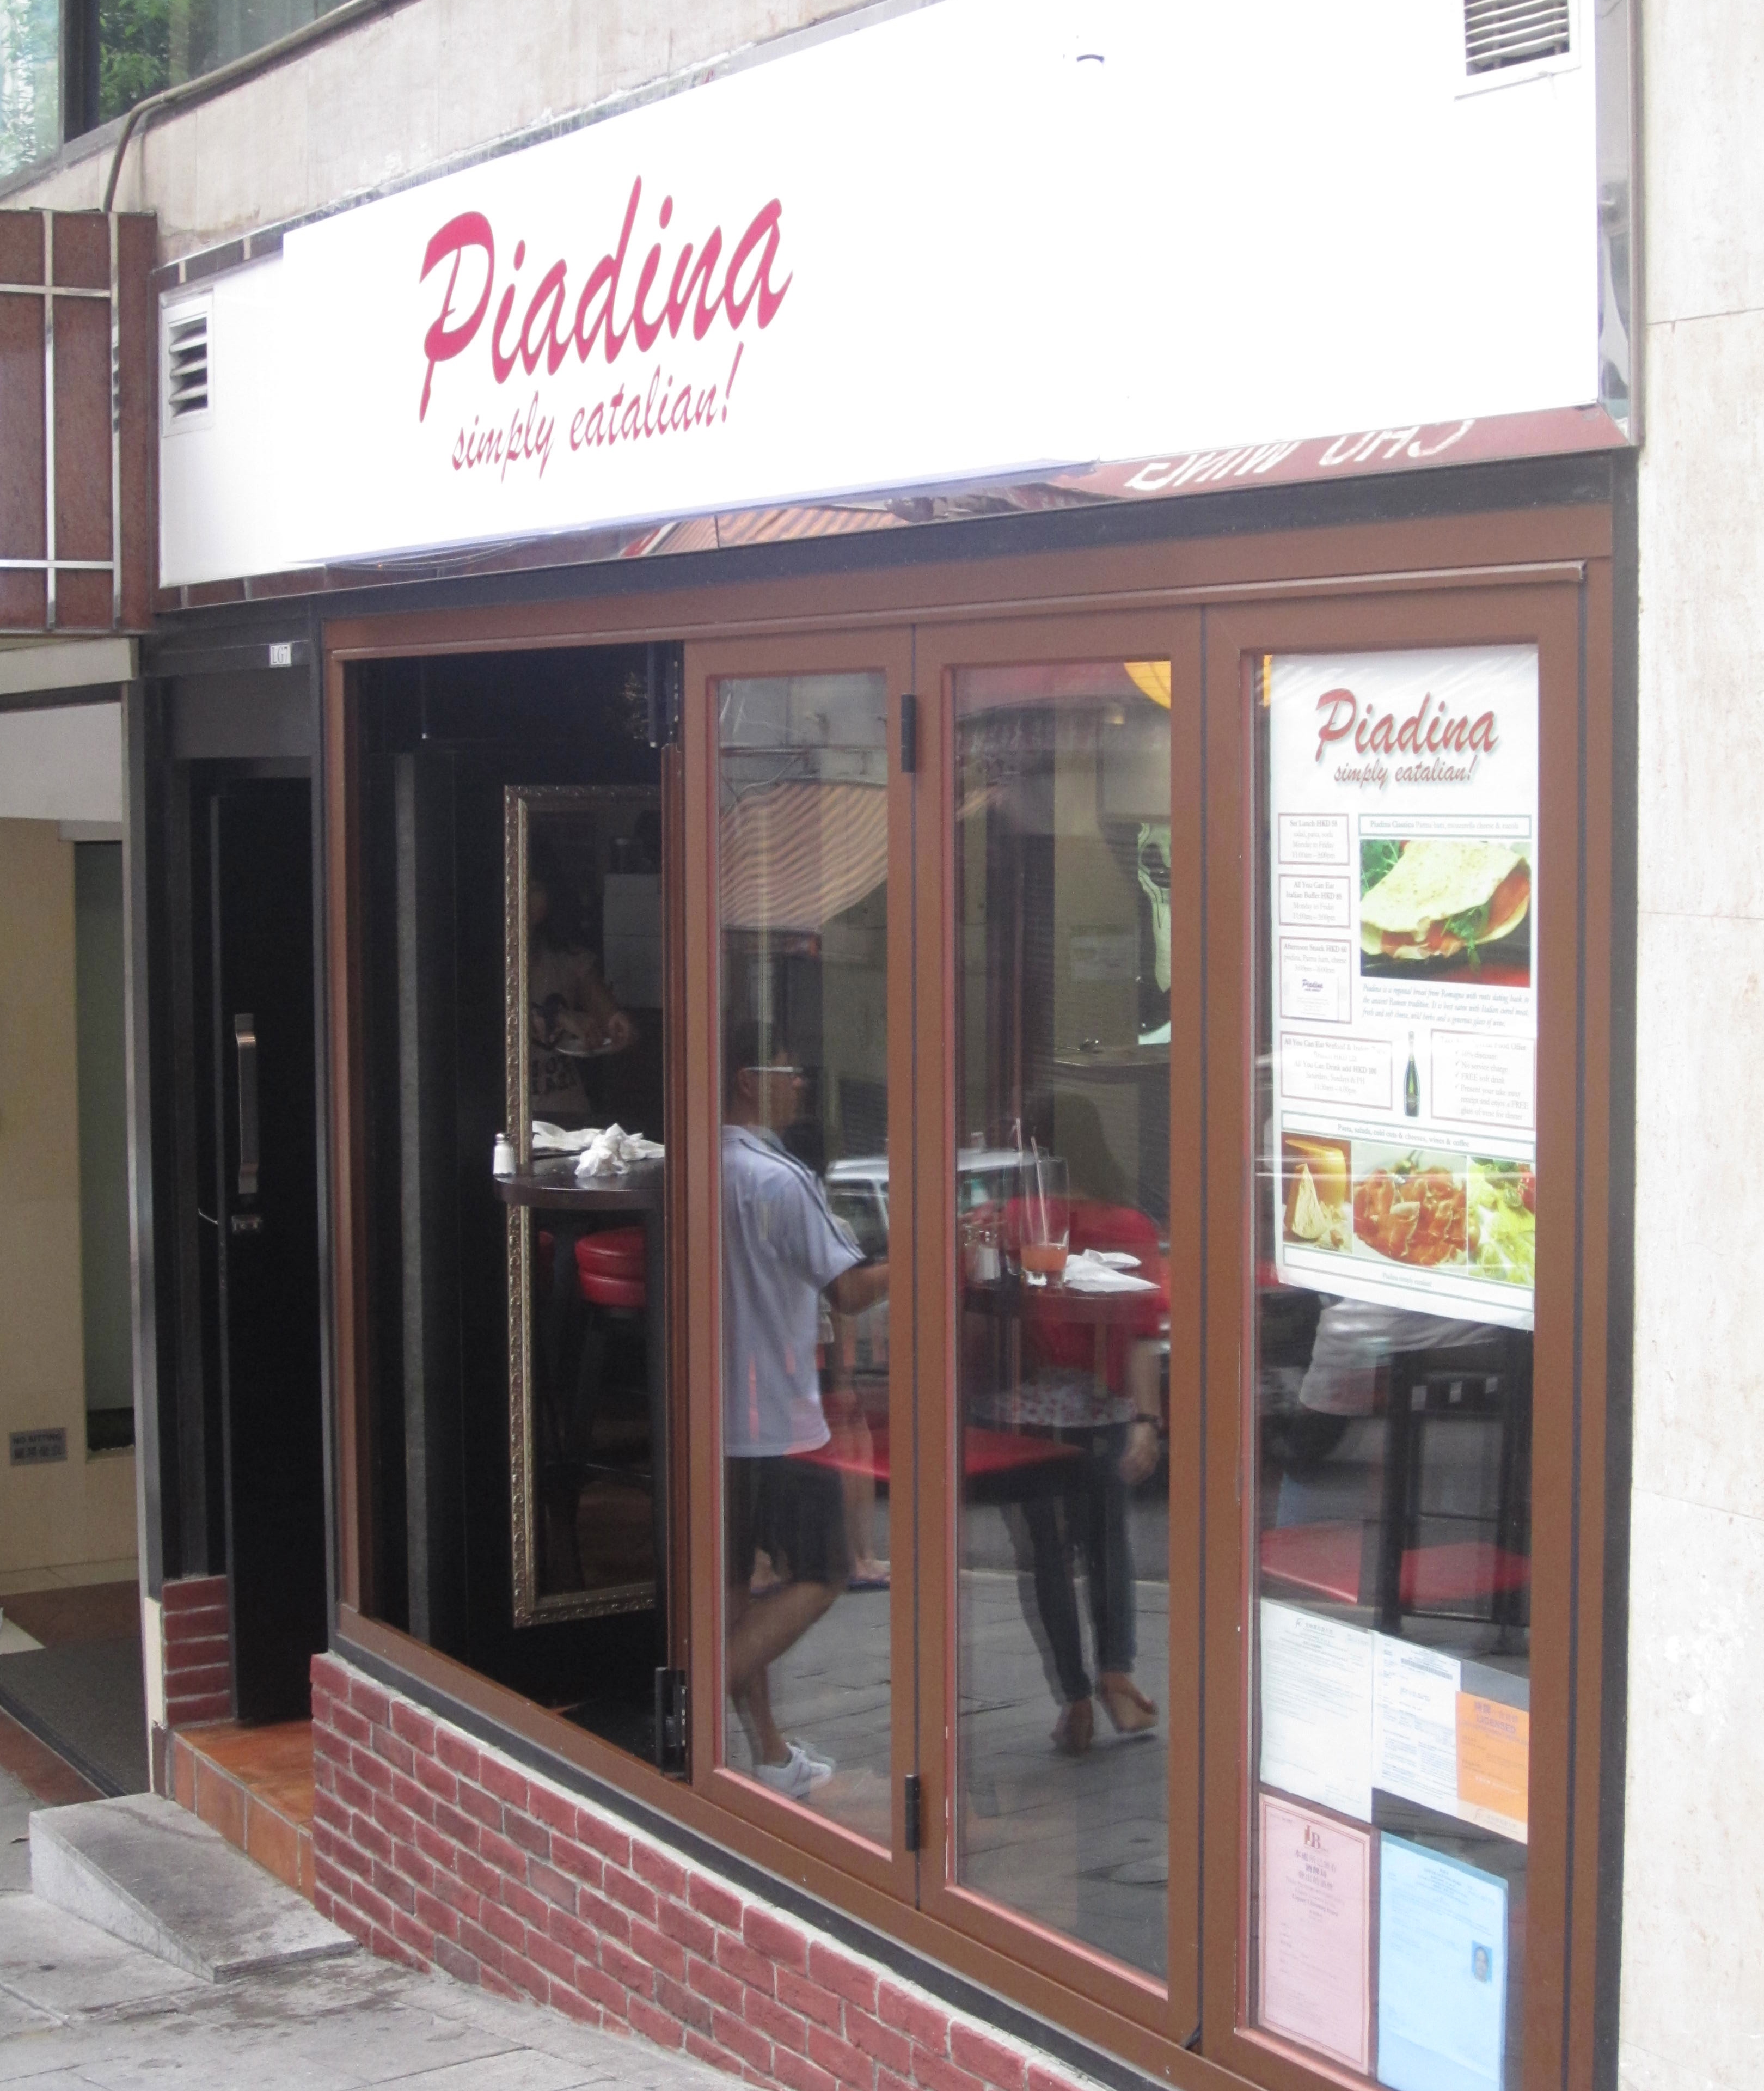 Piadina simply eatalian hong kong